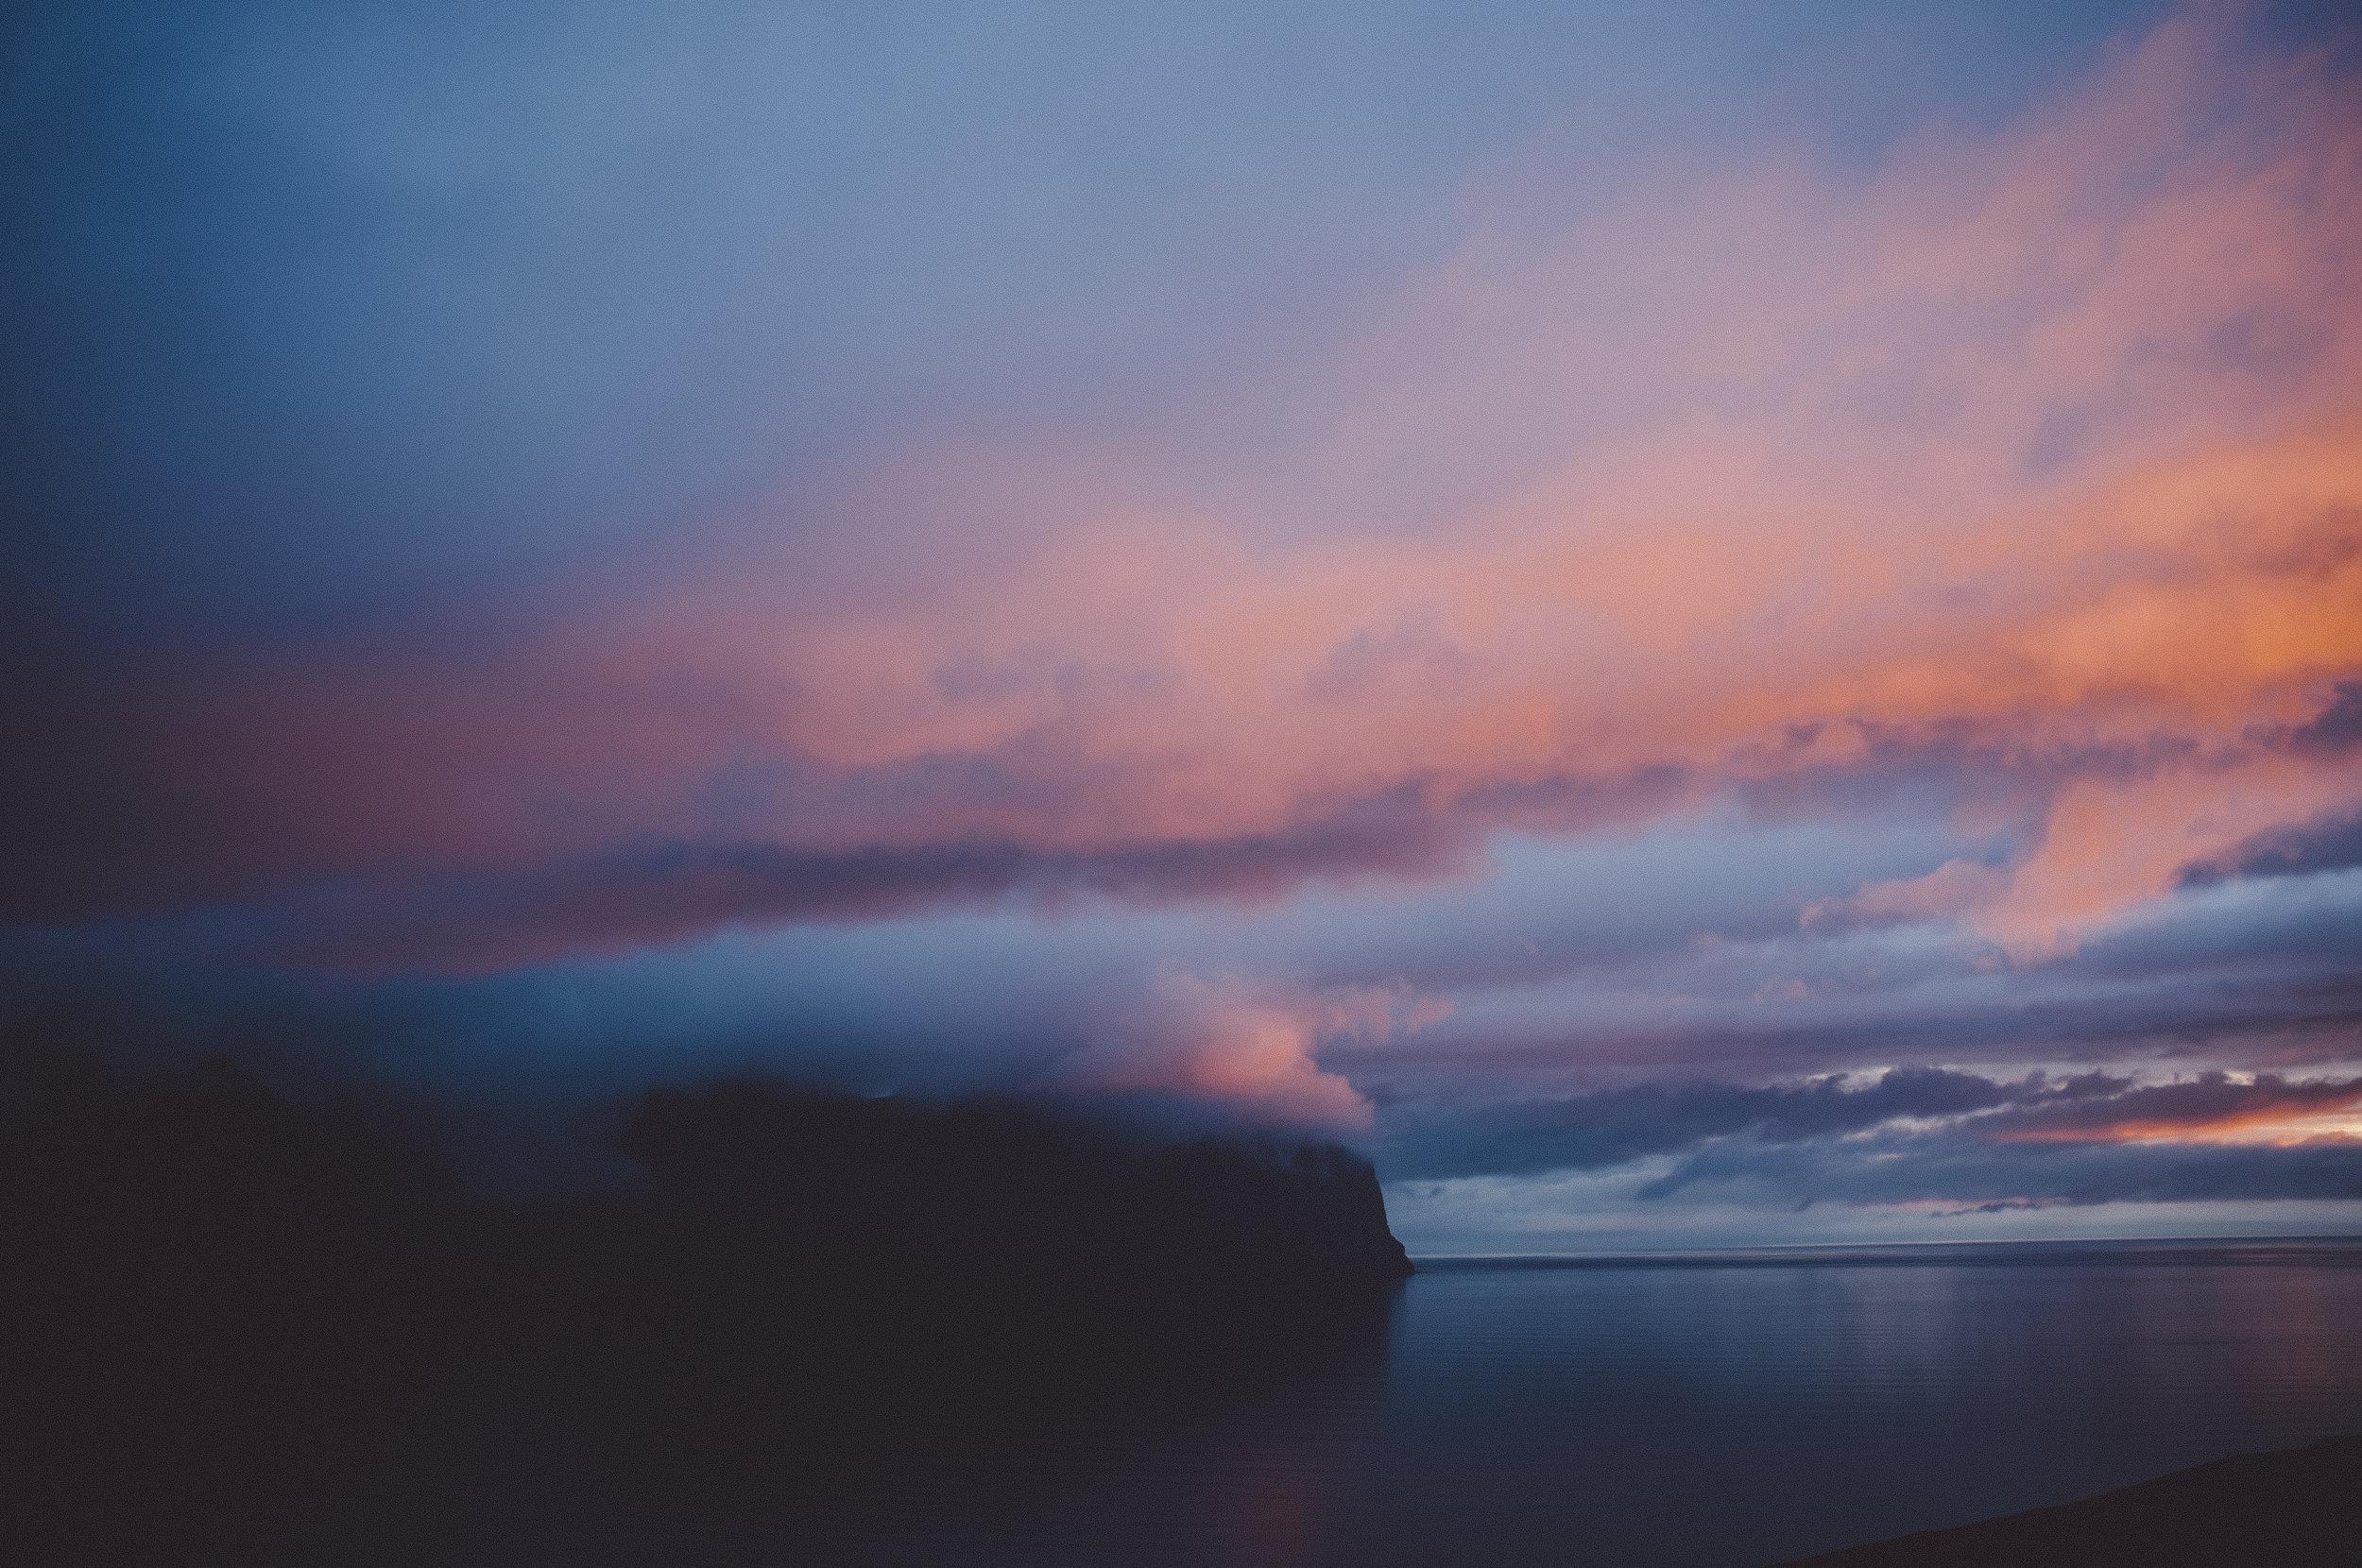 010b_That sky again_5.JPG